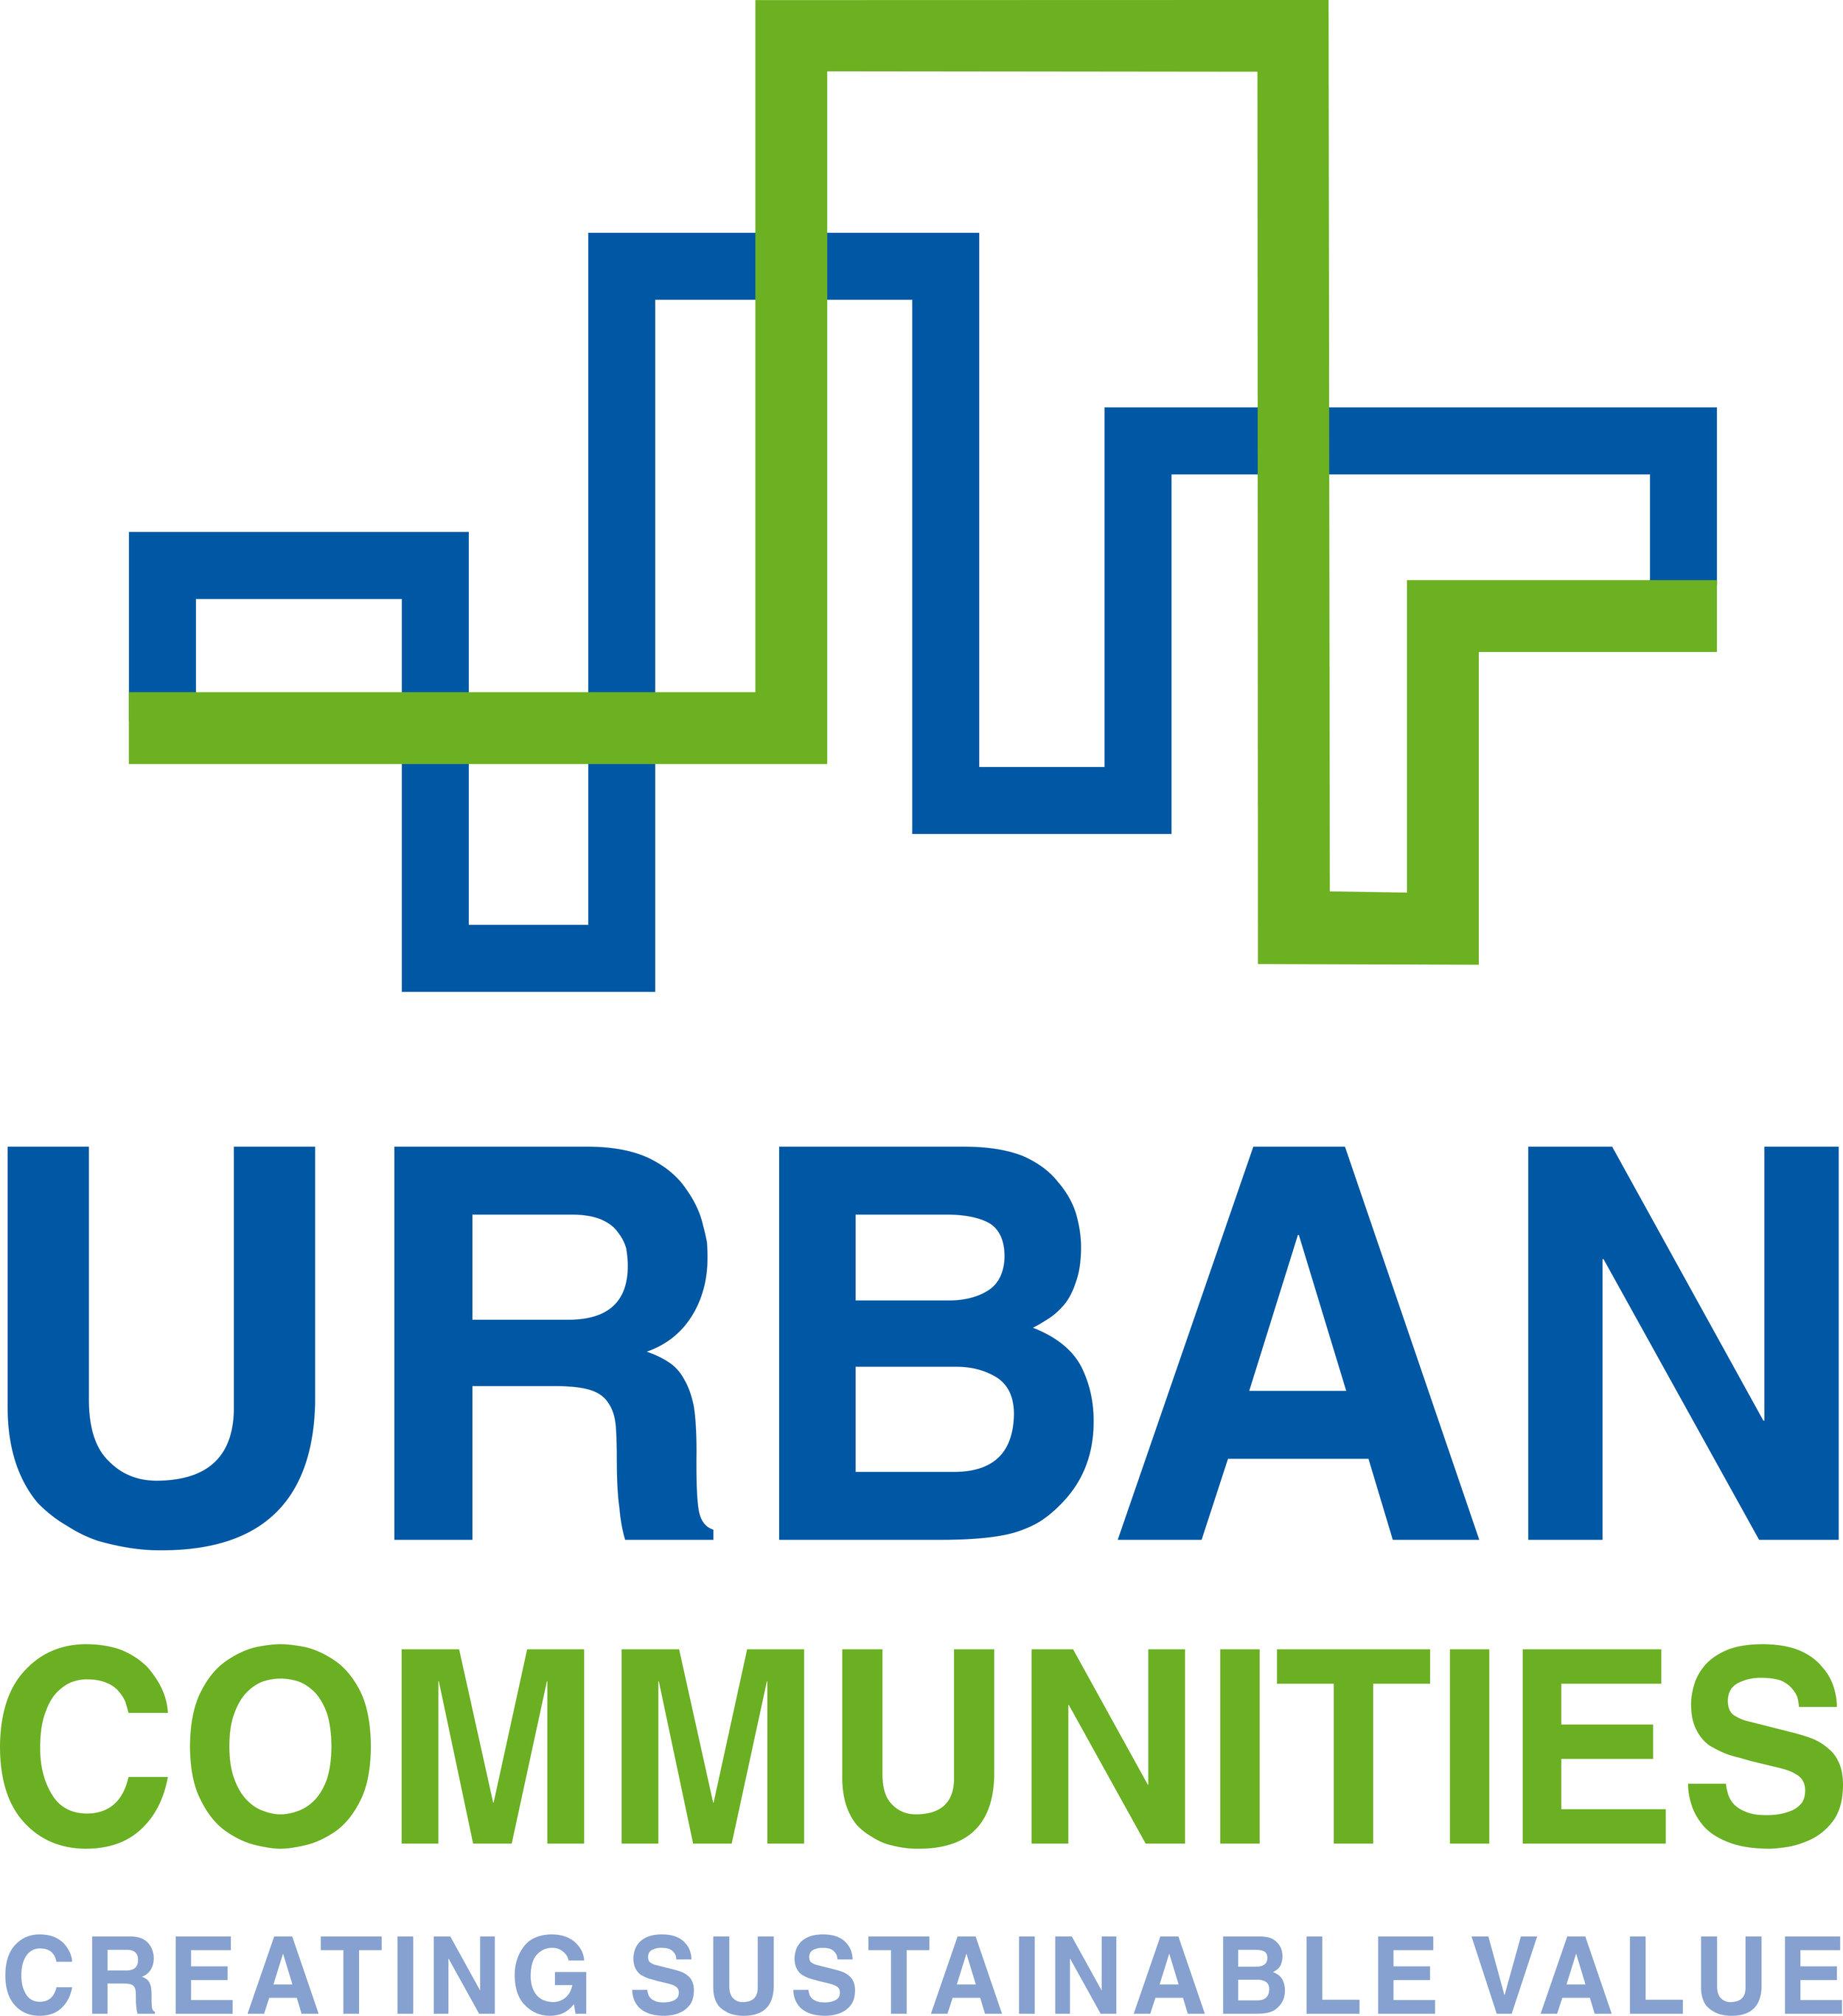 URBAN Communities watermark.jpg